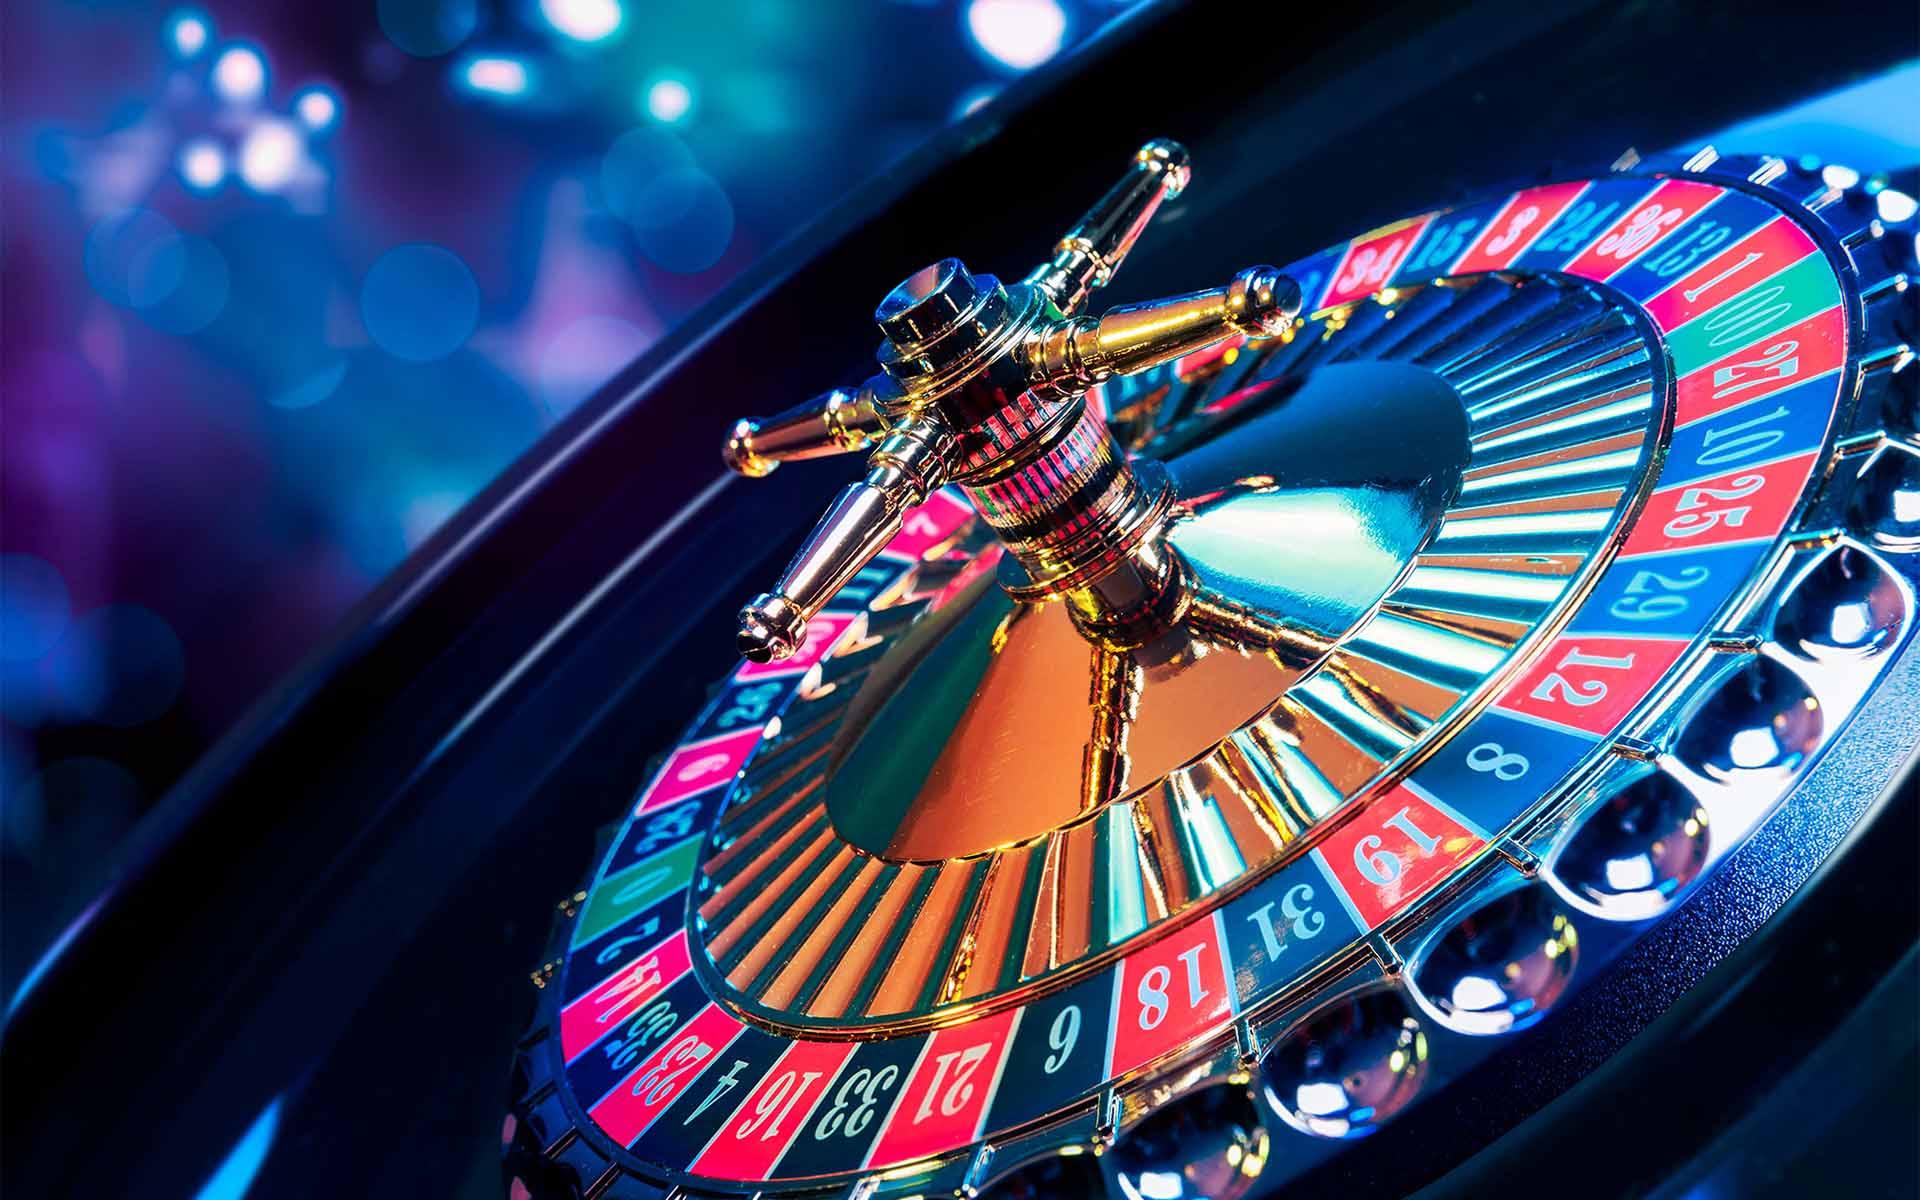 Pa online casino рџЋ–пёЏ claim best real money no deposit bonus в–¶пёЏ